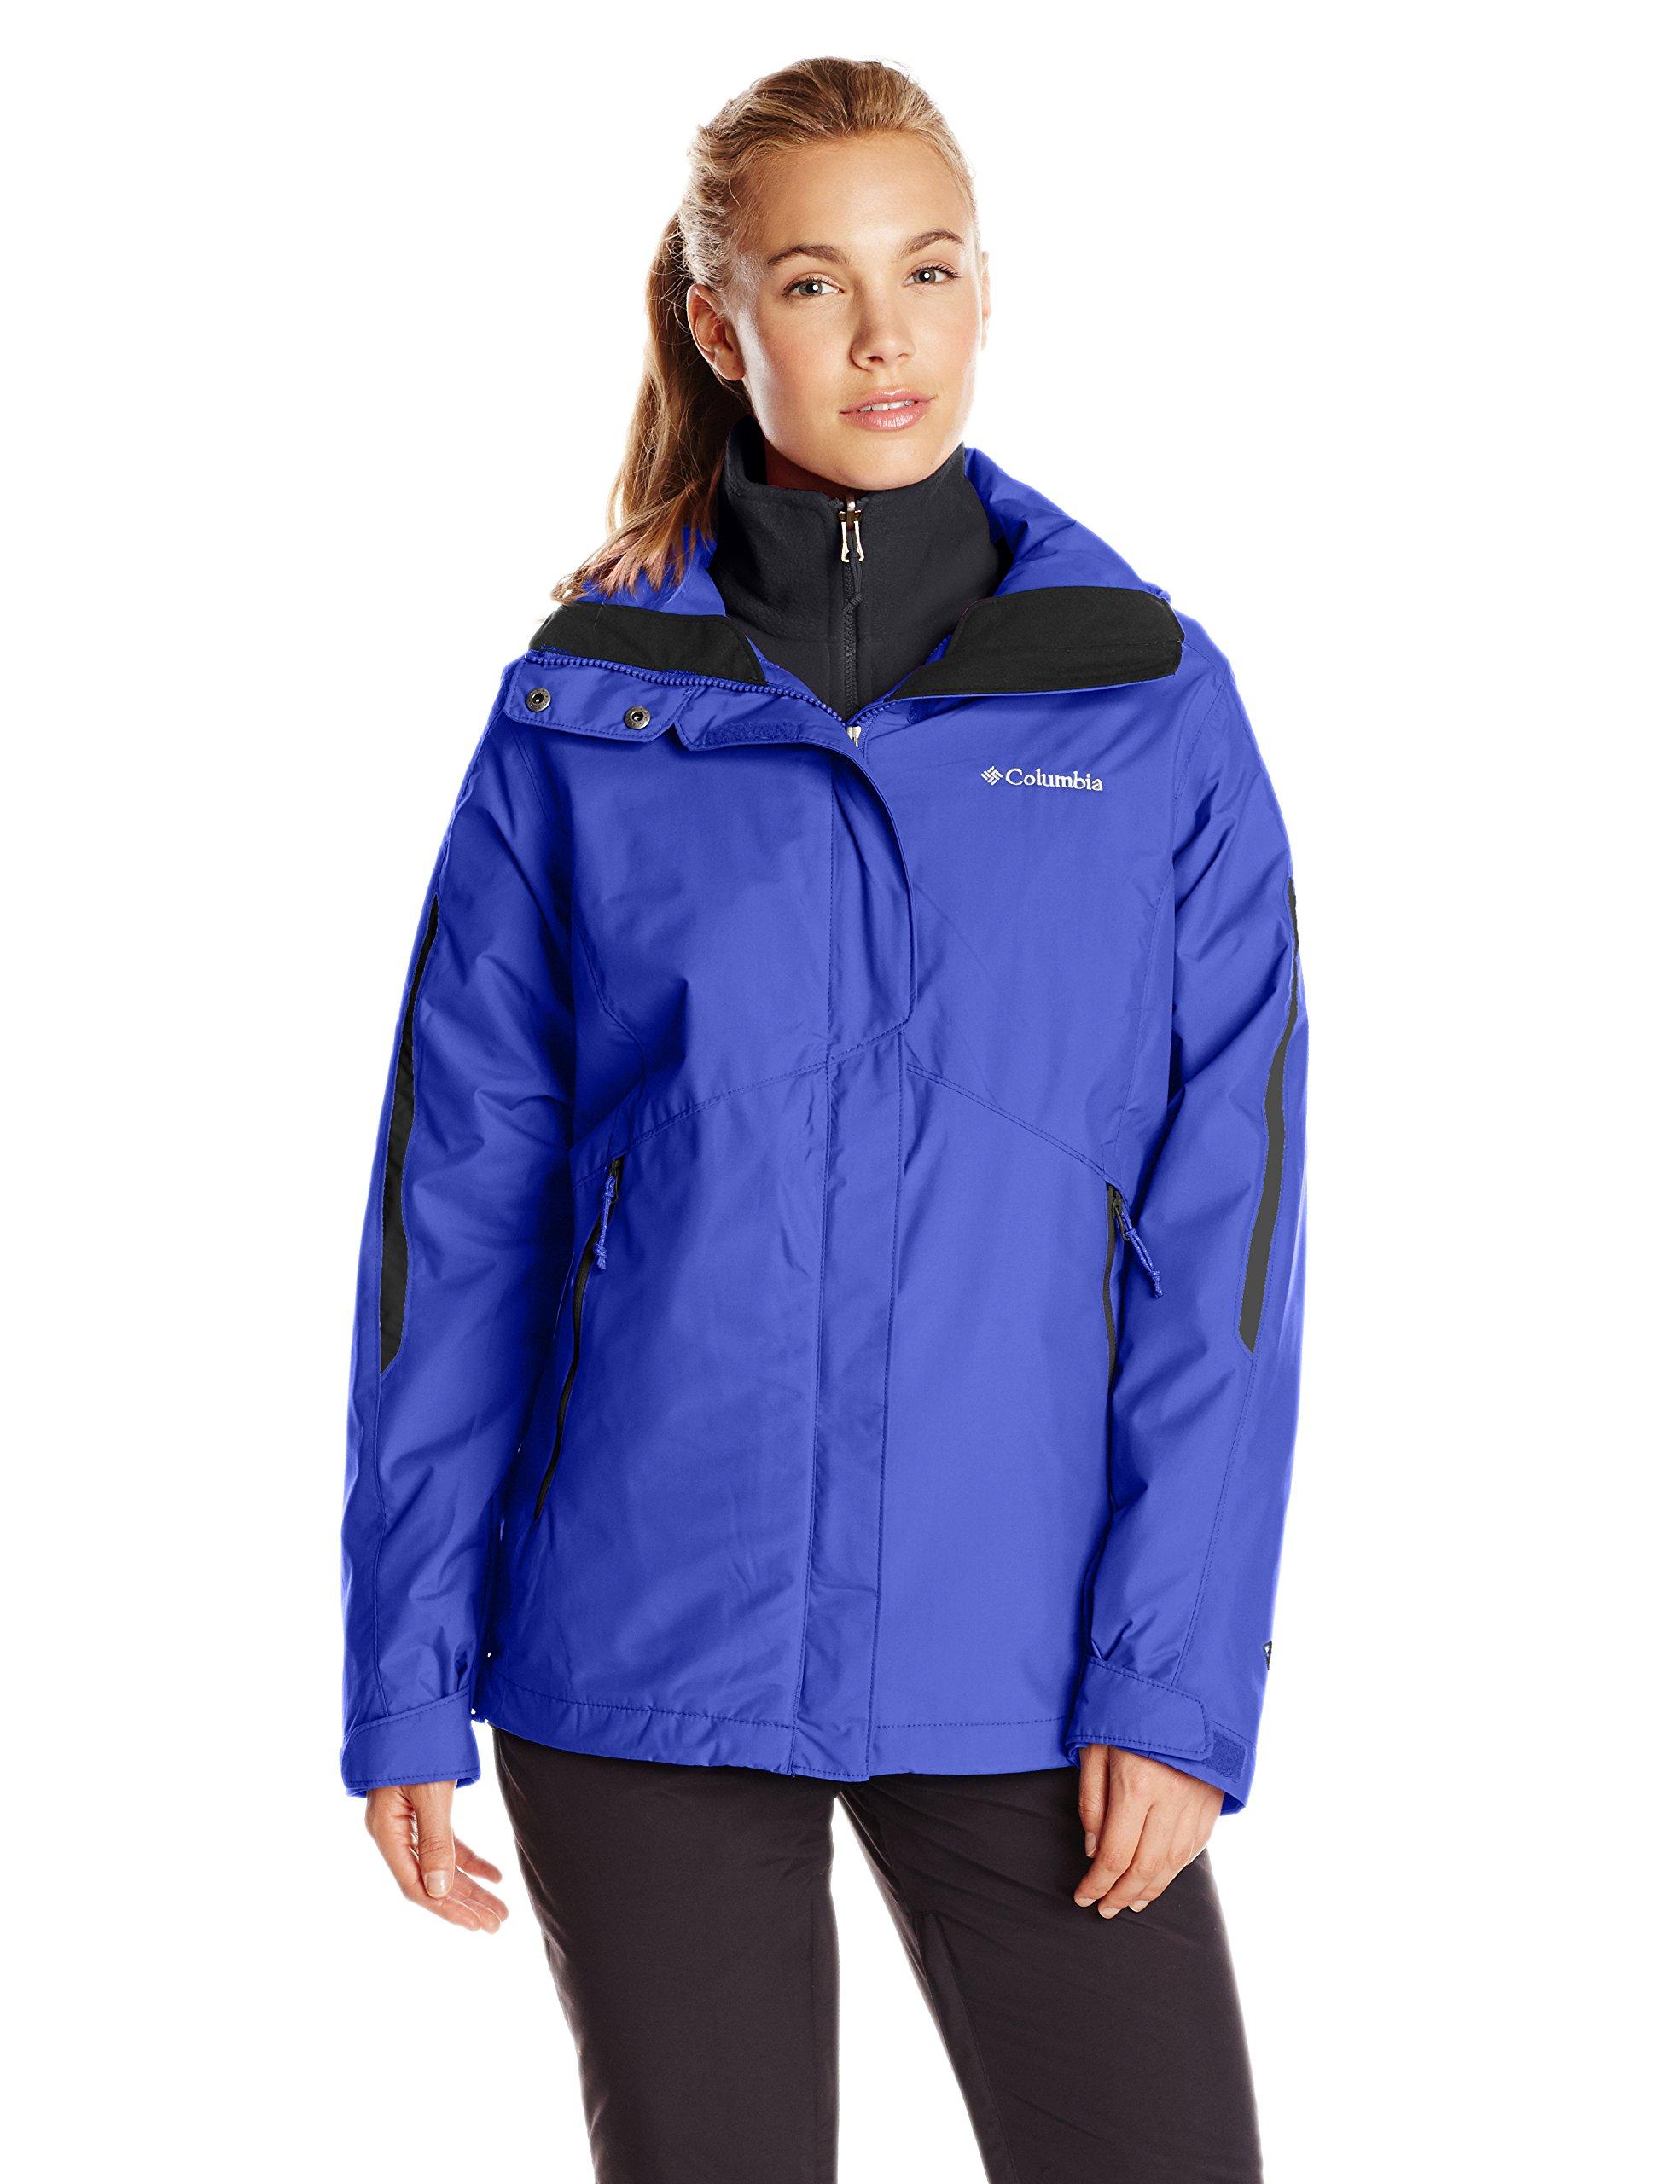 Columbia Women's Bugaboo Interchange Jacket, Clematis Blue, X-Large